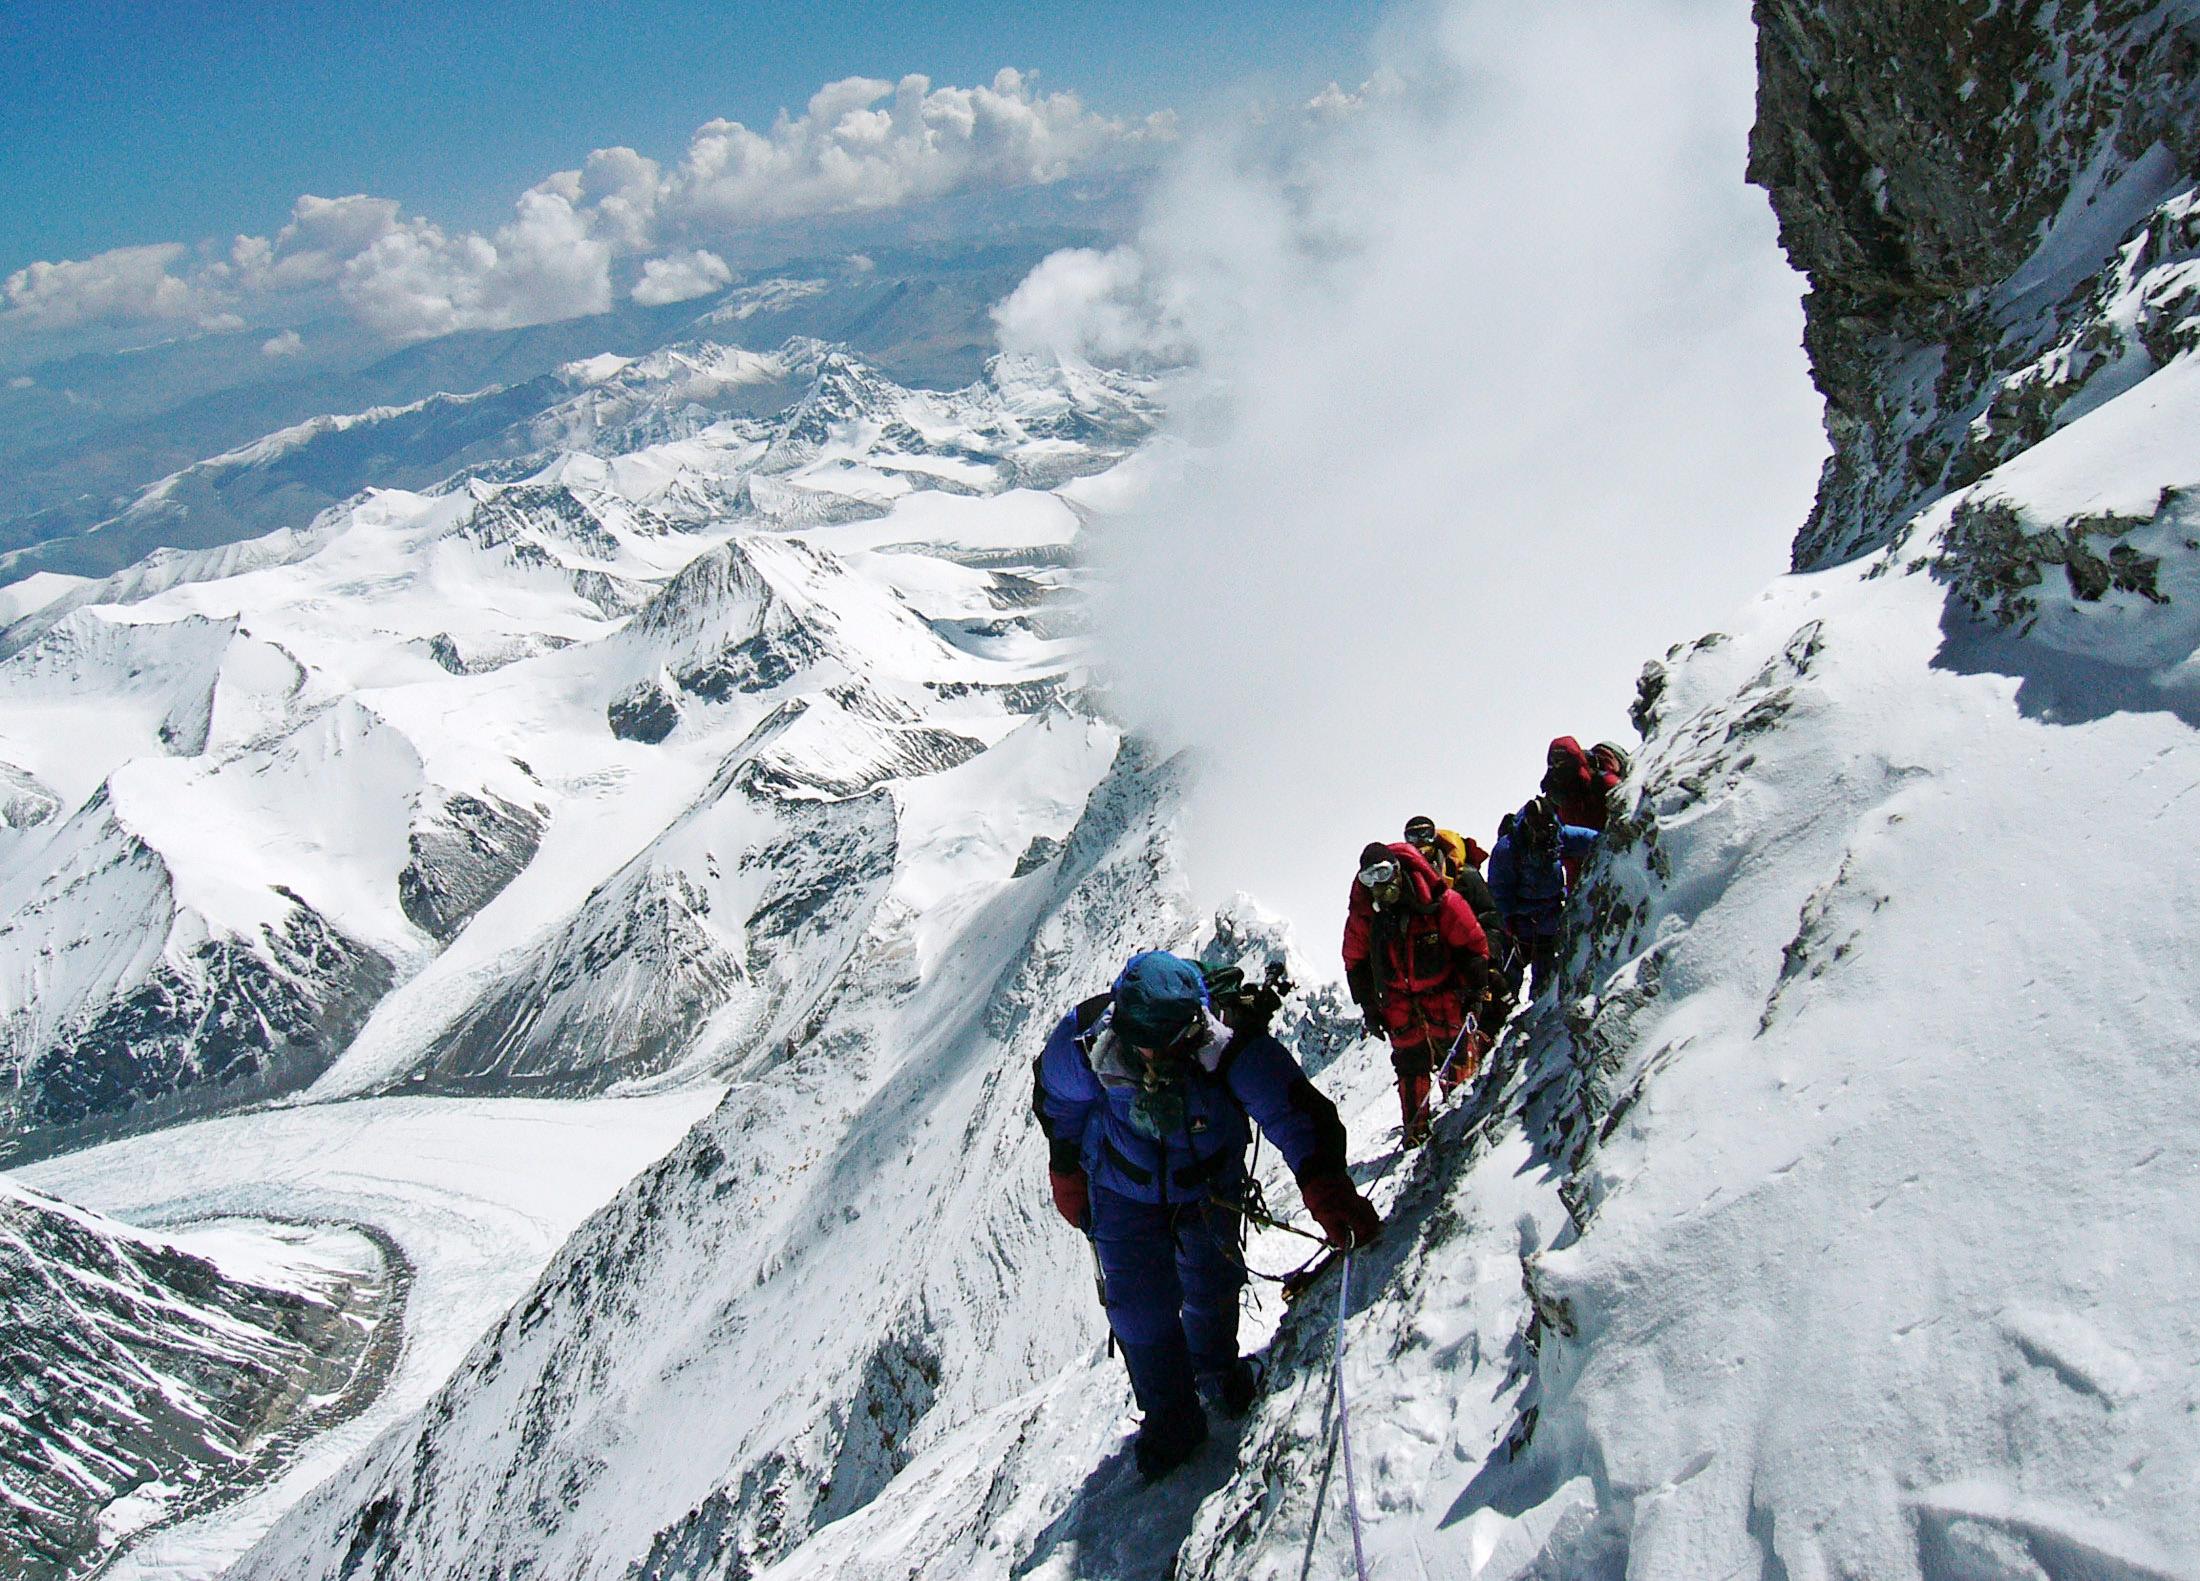 Snow Falling Desktop Wallpaper Mount Everest Deadly Everest Pictures Cbs News